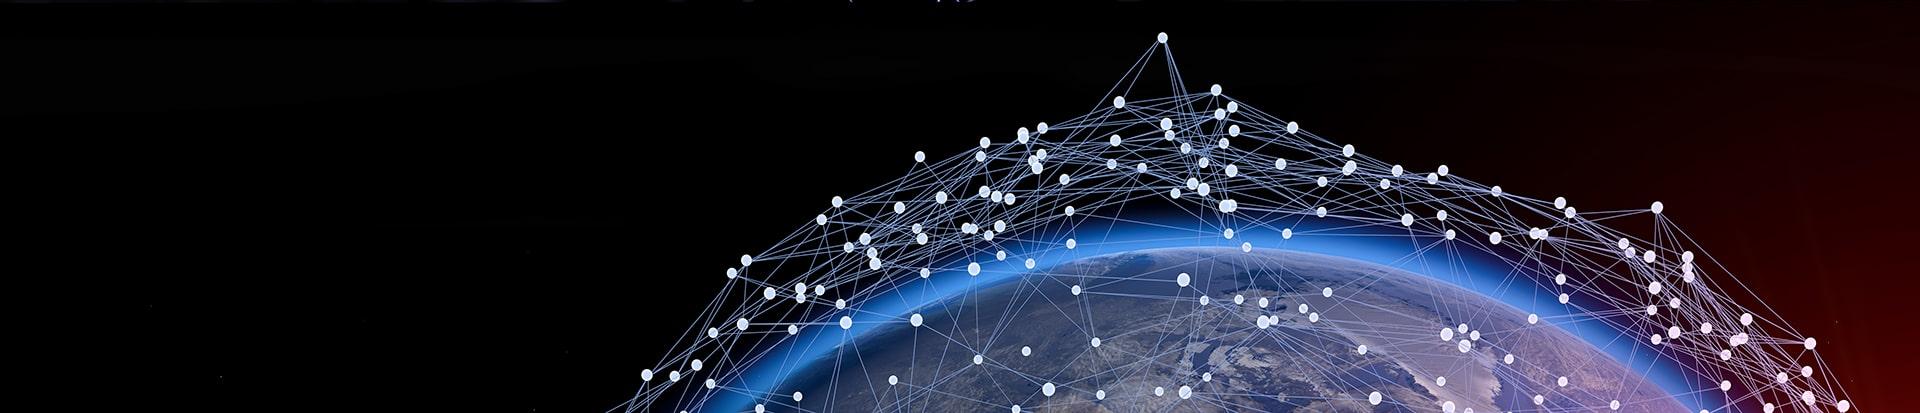 SimAltNAV Replay for GNSS and alternative RF navigation testing